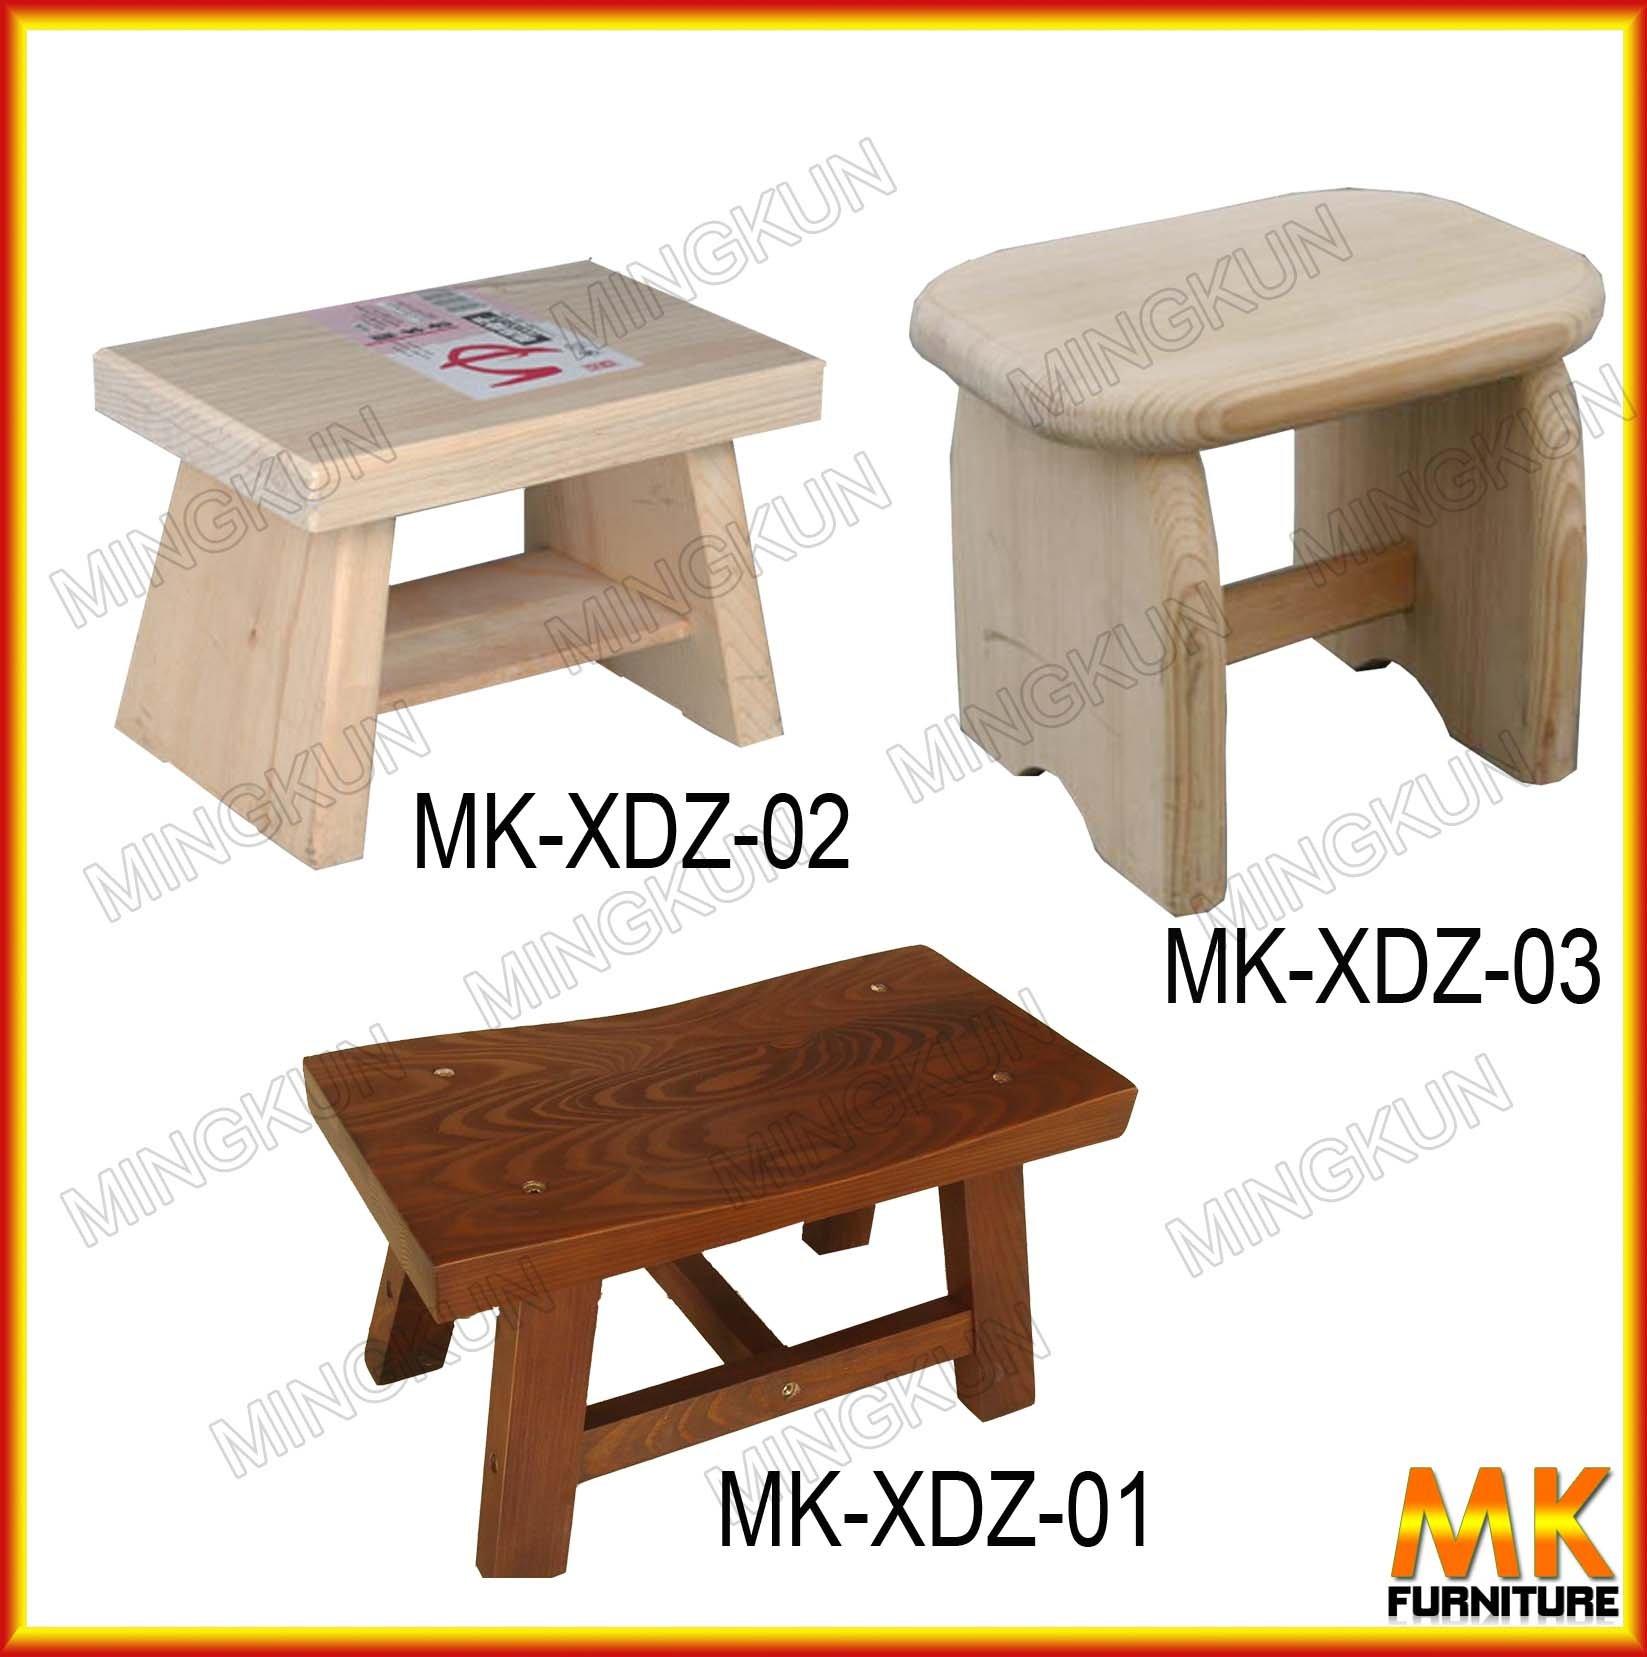 wooden small stool : woodensmallstool from www.alibaba.com size 1647 x 1657 jpeg 218kB